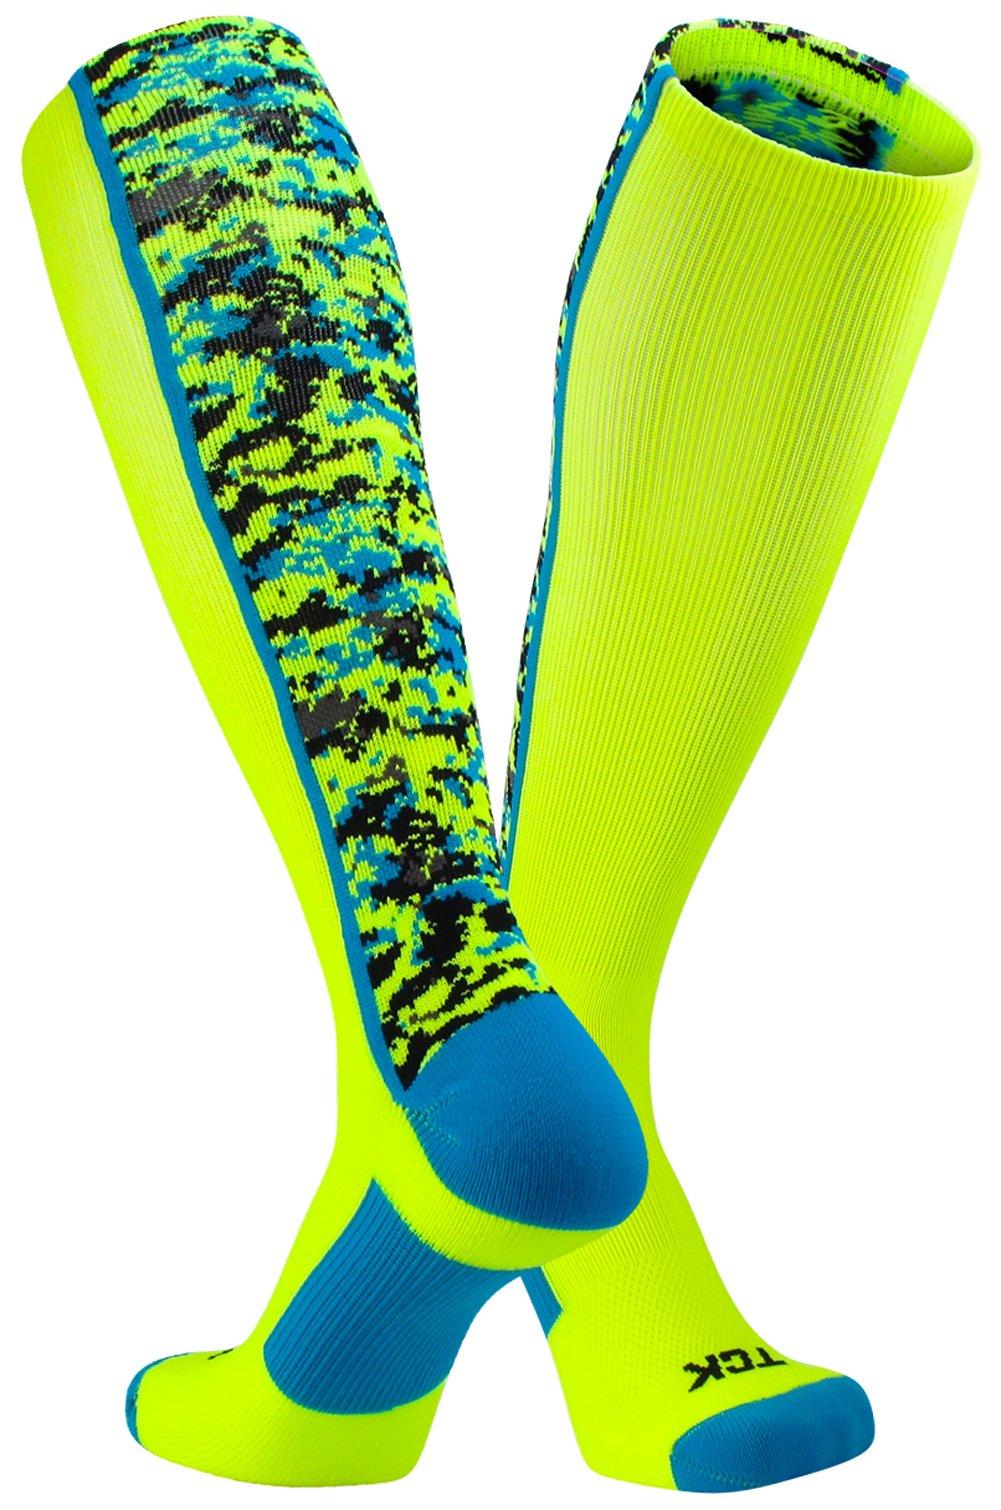 TCK Sports Digital Camo Over The Calf Socks (Neon Yellow/Electric Blue, Small)